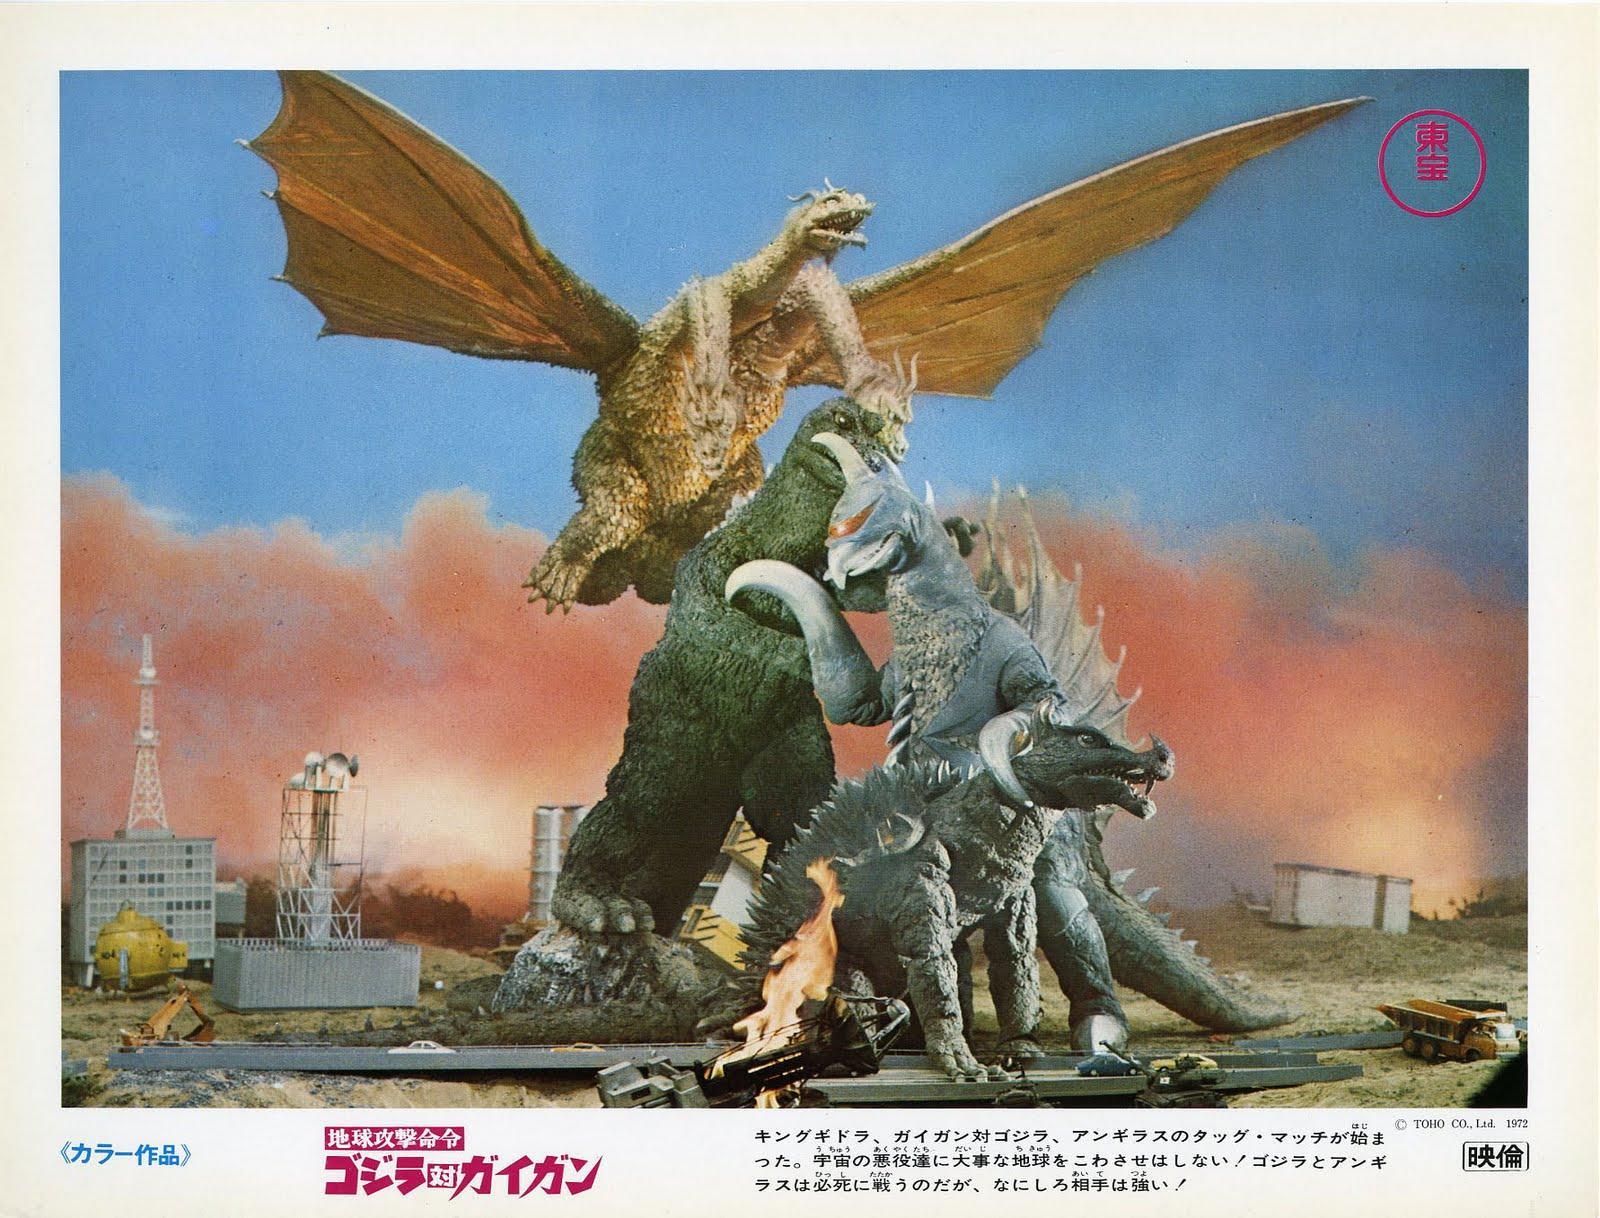 Best 59 Gigan Monster Background on HipWallpaper Cute Monster 1600x1218